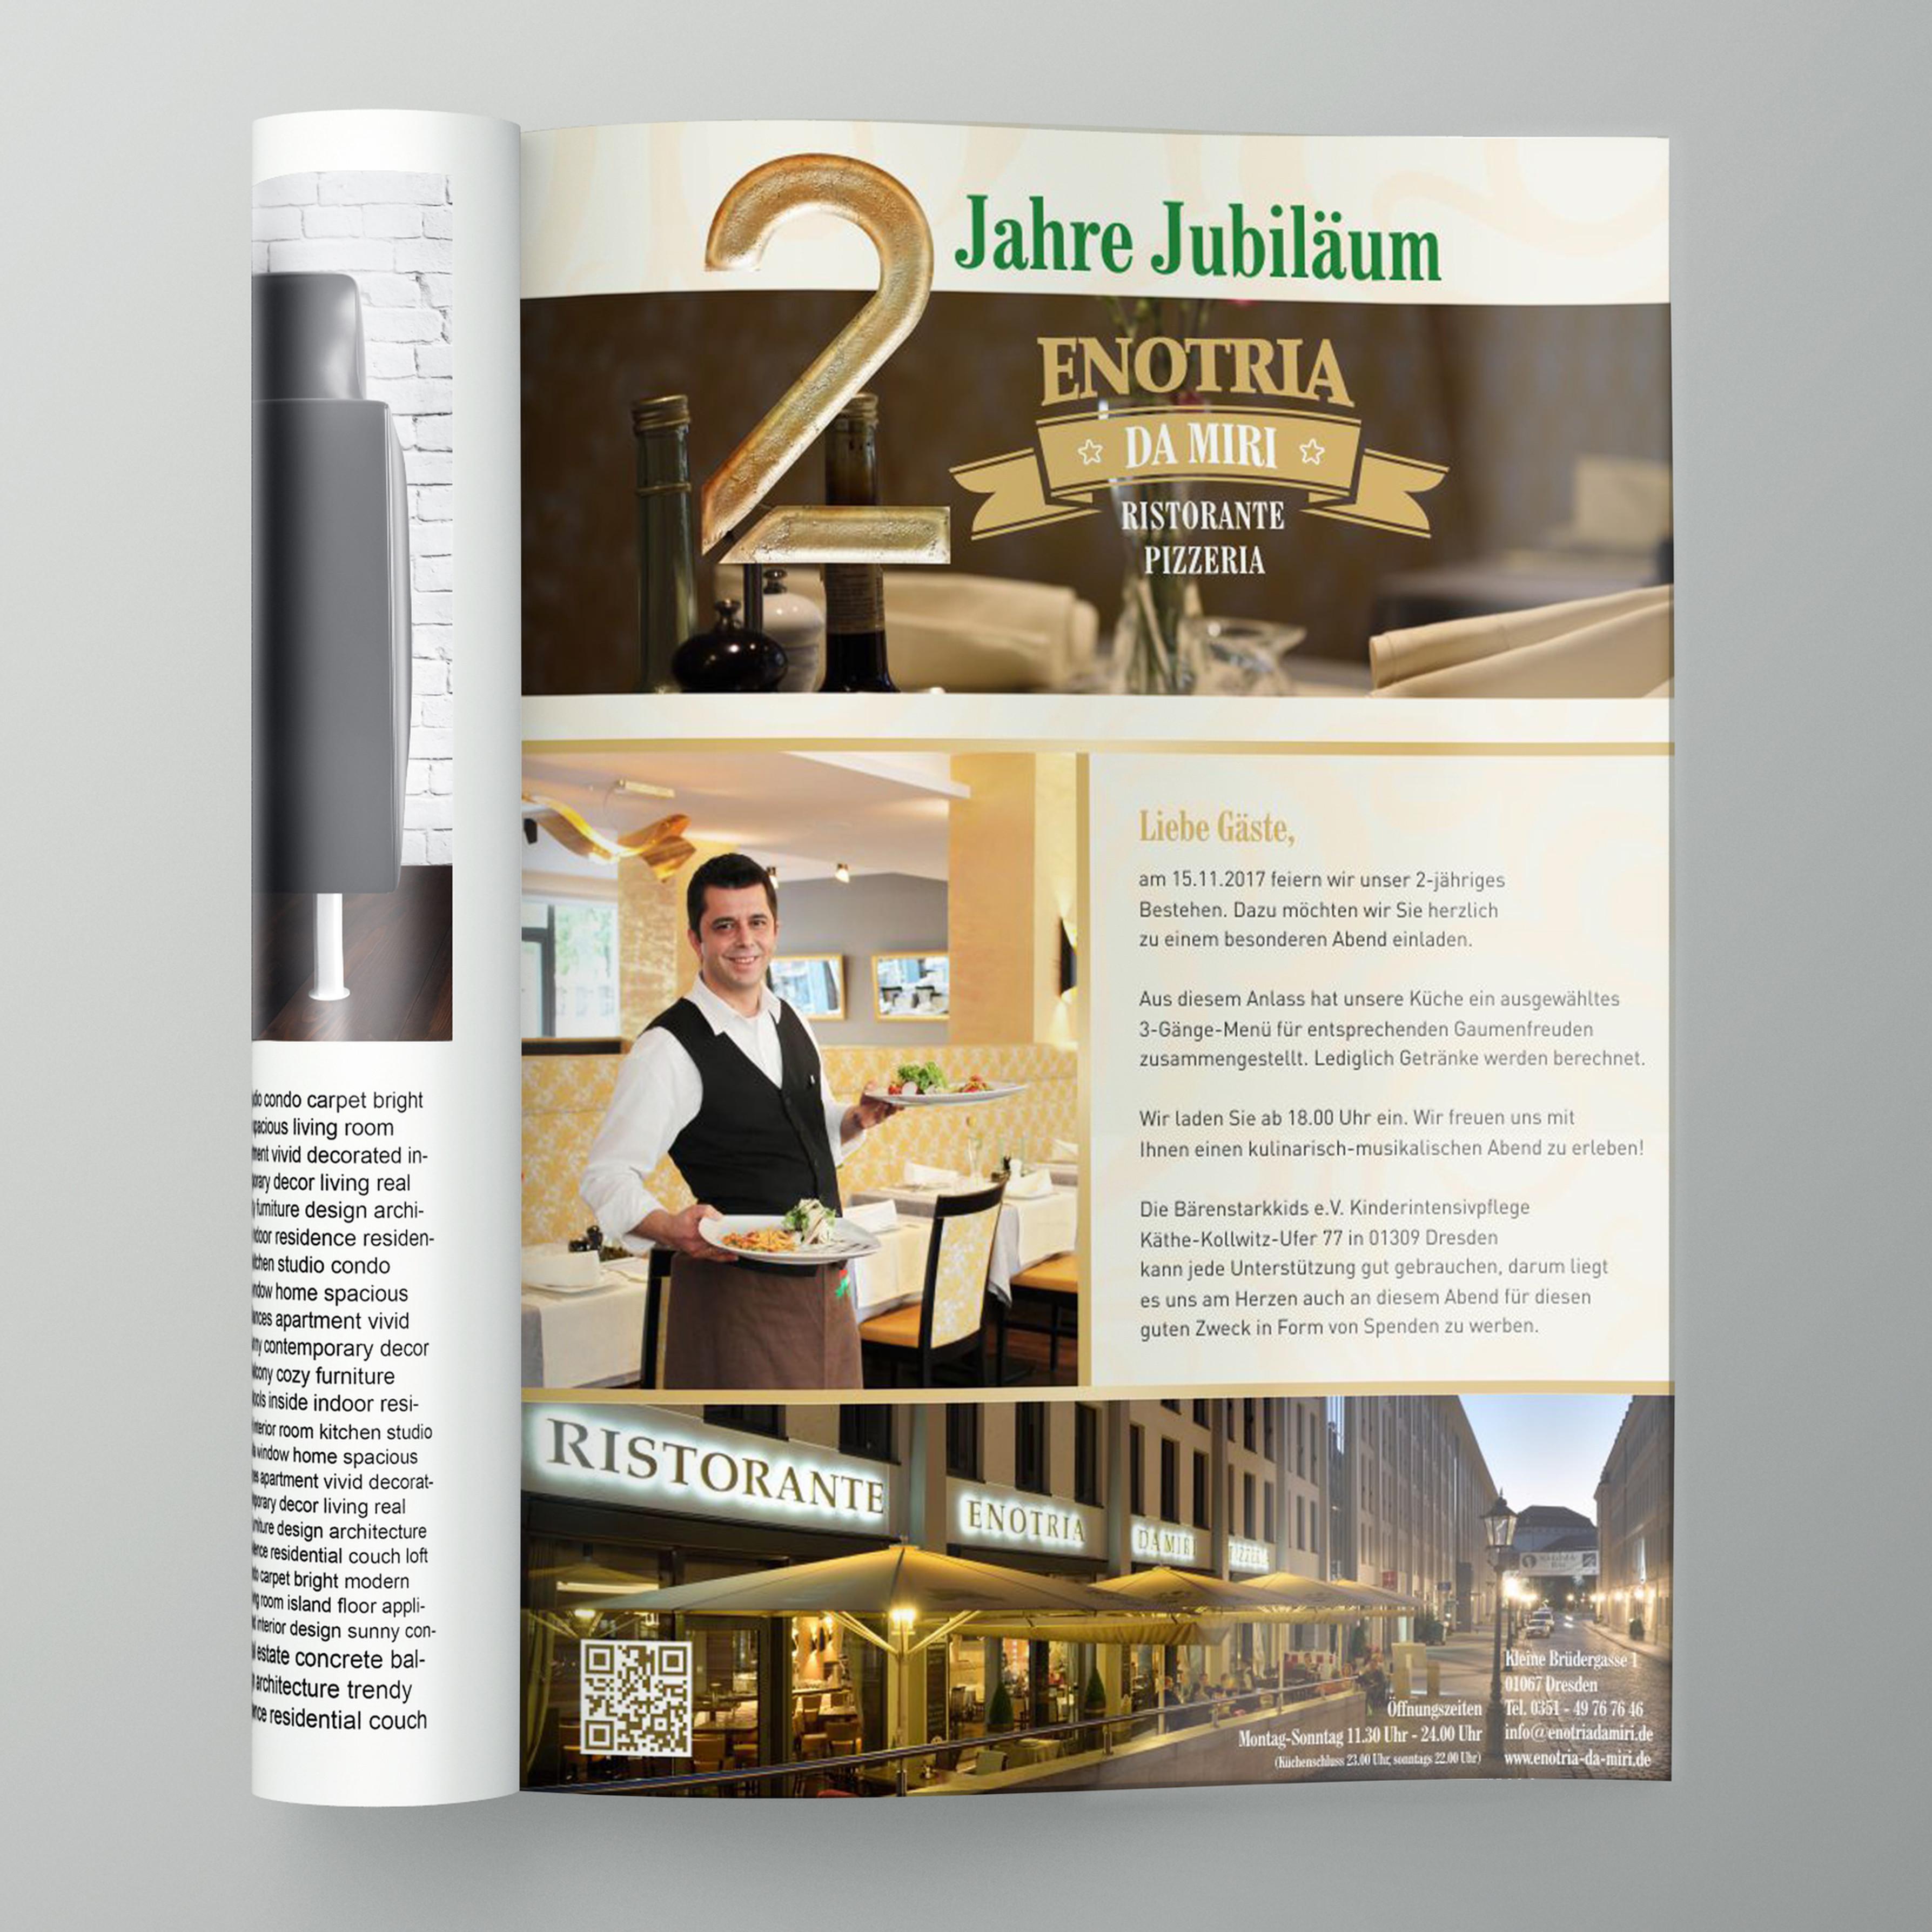 ENOTRIA DA MIRI; Corporate Design, Print